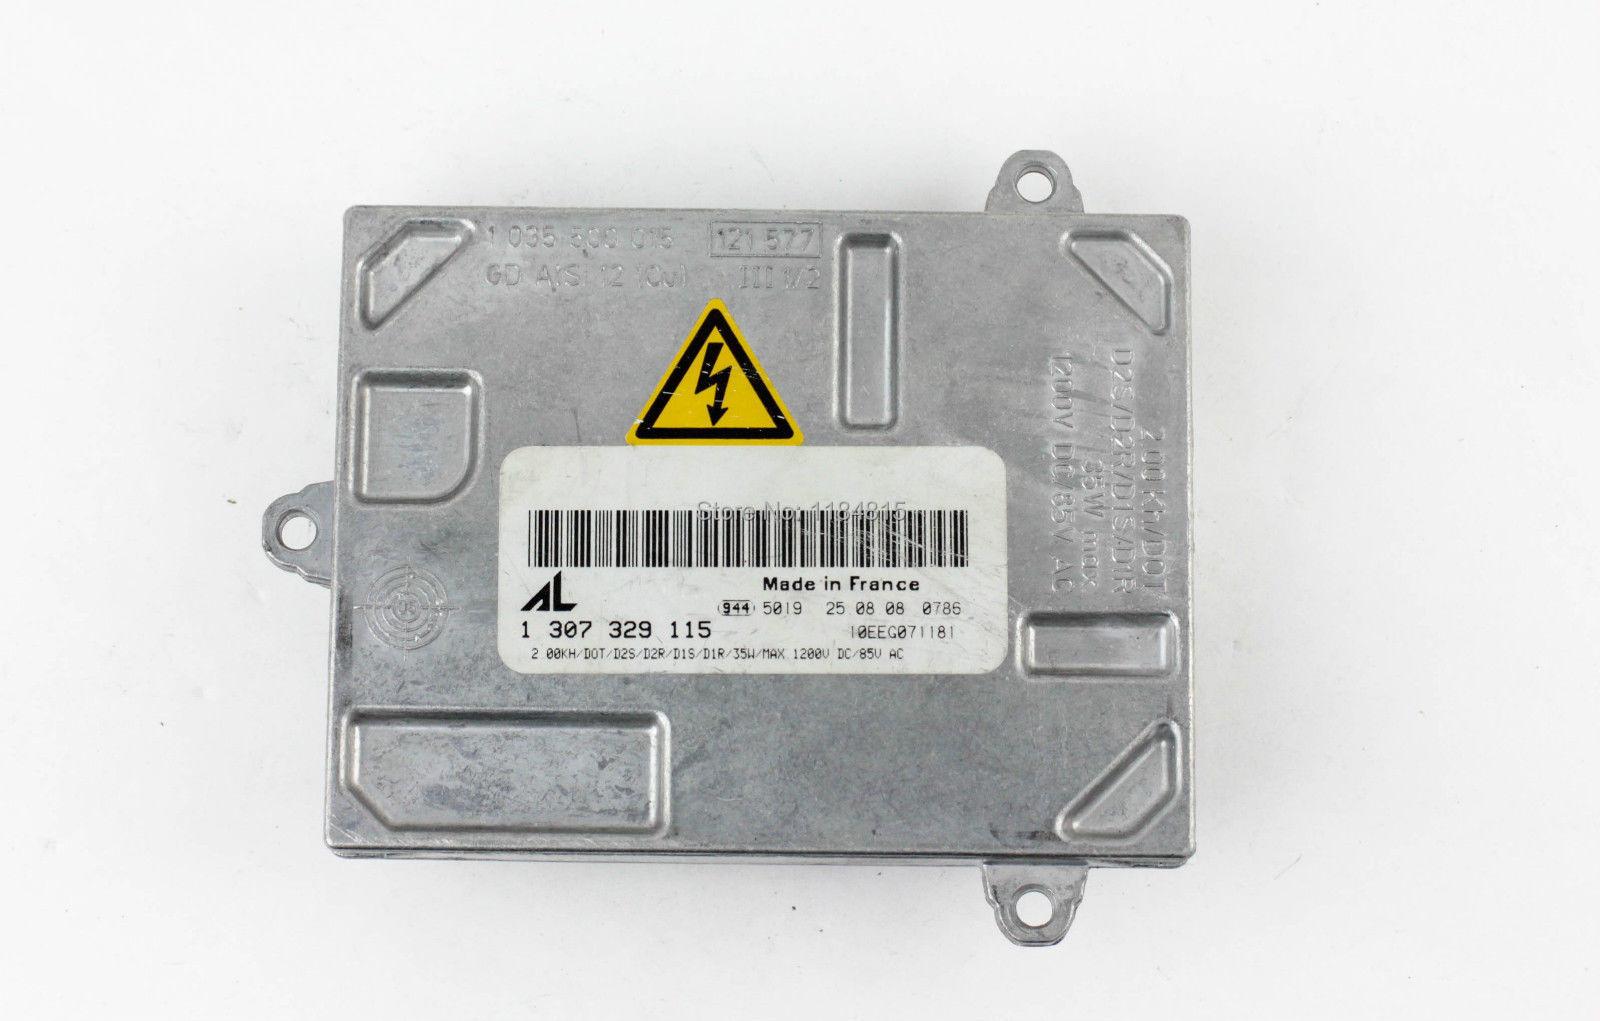 2006-2008 For Audi A3 Xenon Headlight HID Ballast Control Module OEM 8E0907391B(China (Mainland))